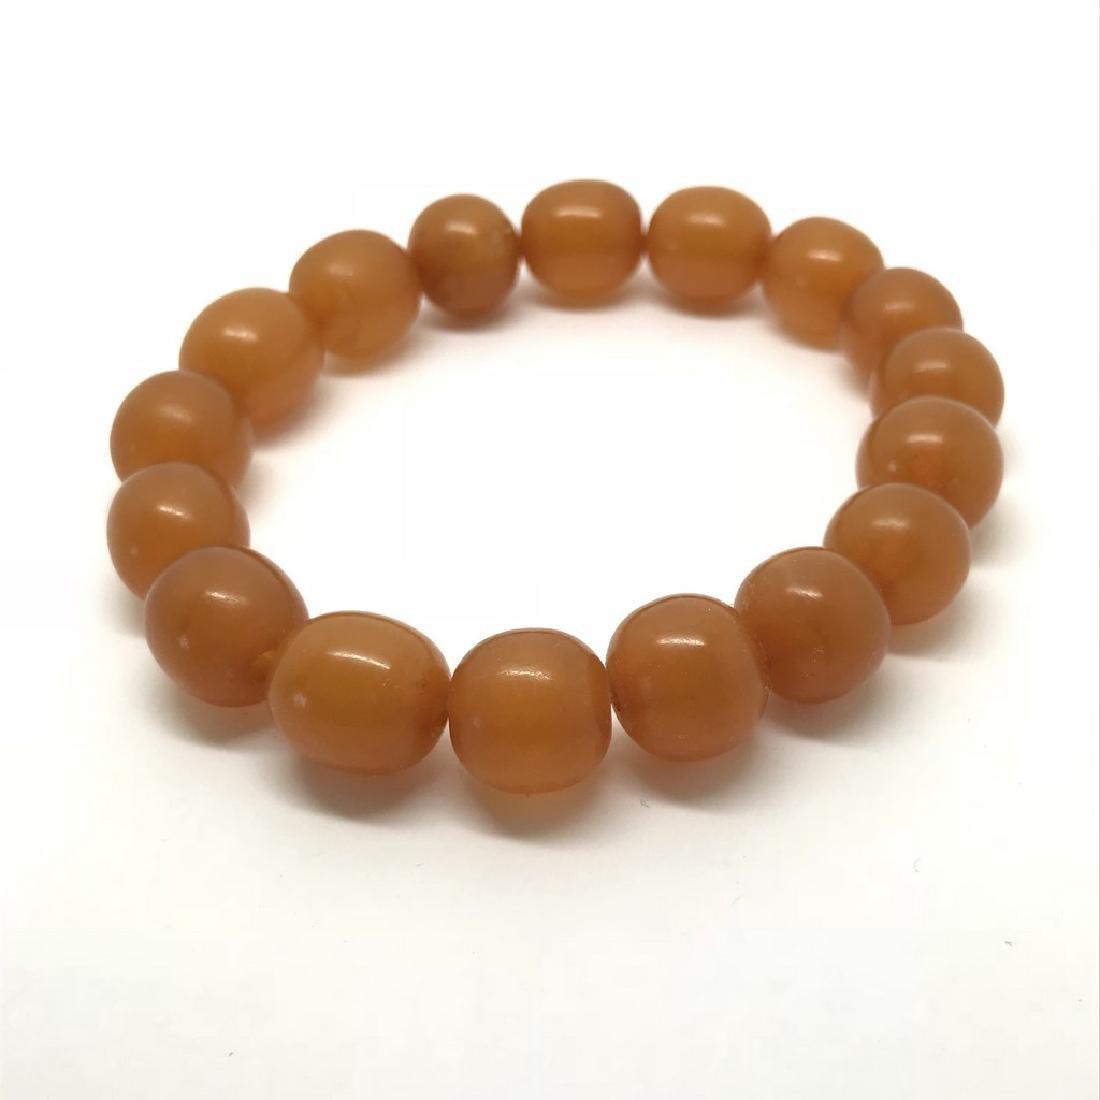 Vintage bracelet Baltic amber butterscotch beads - 3